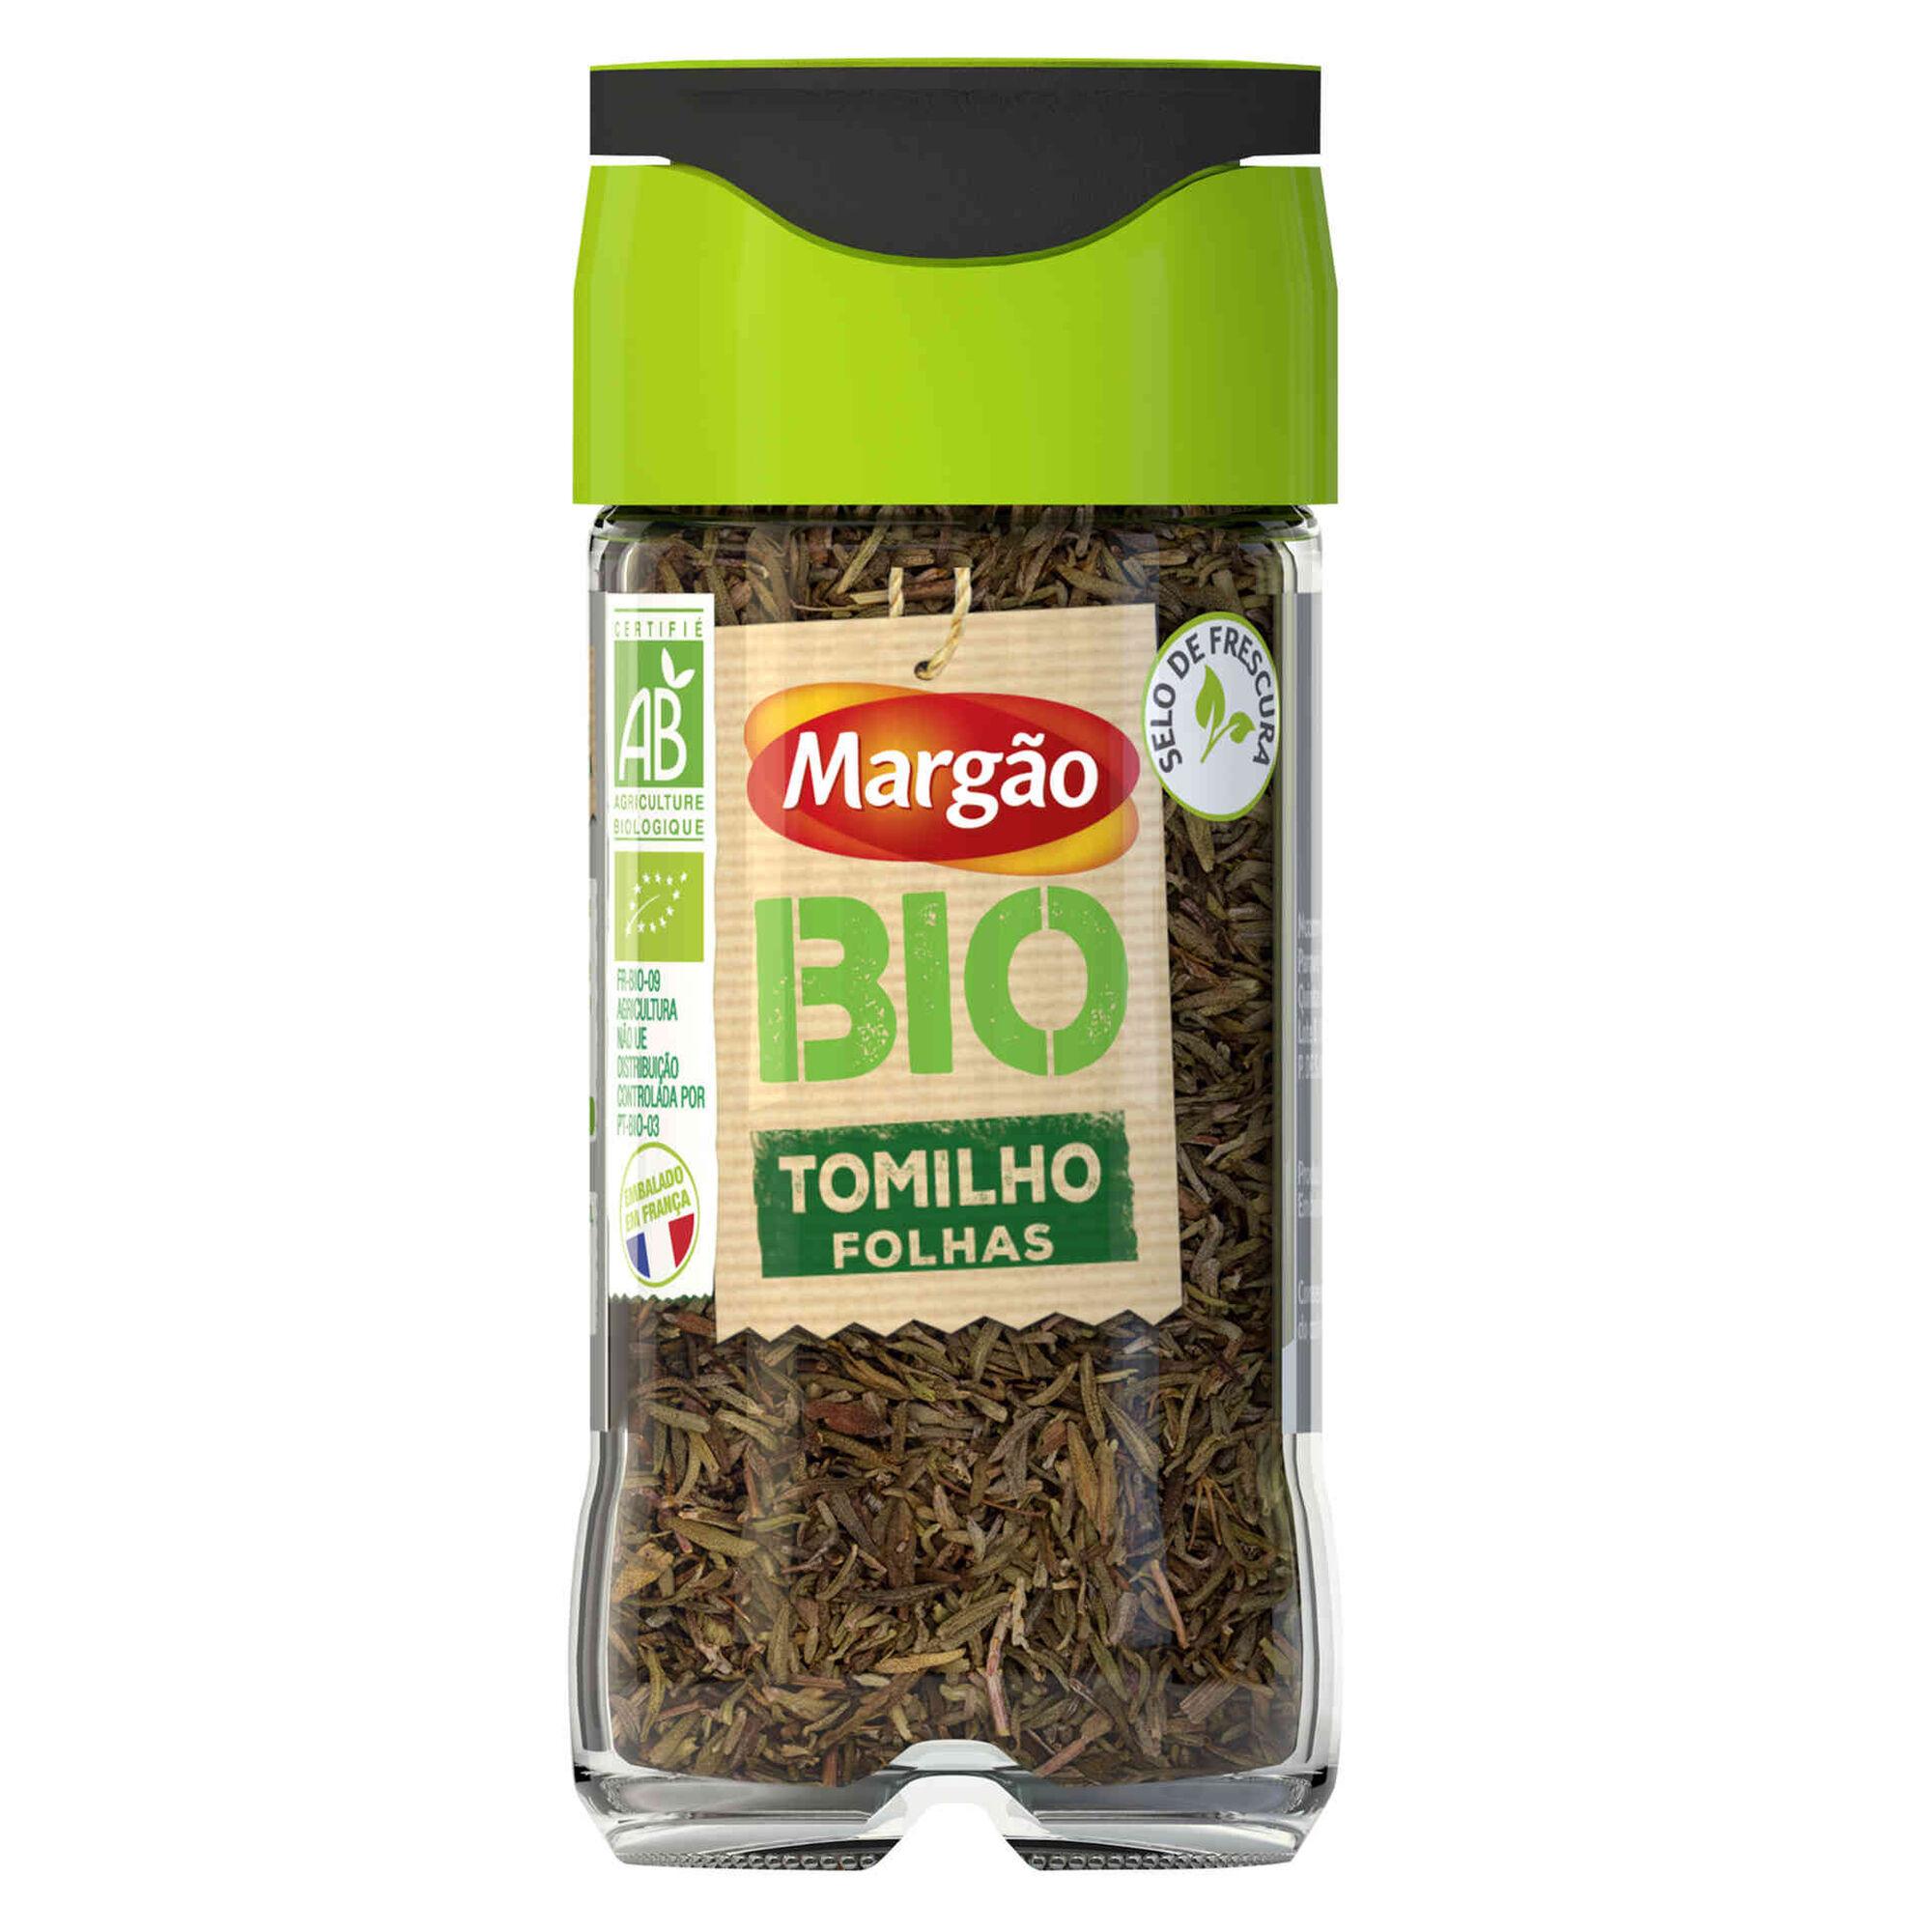 Tomilho Folhas Biológico